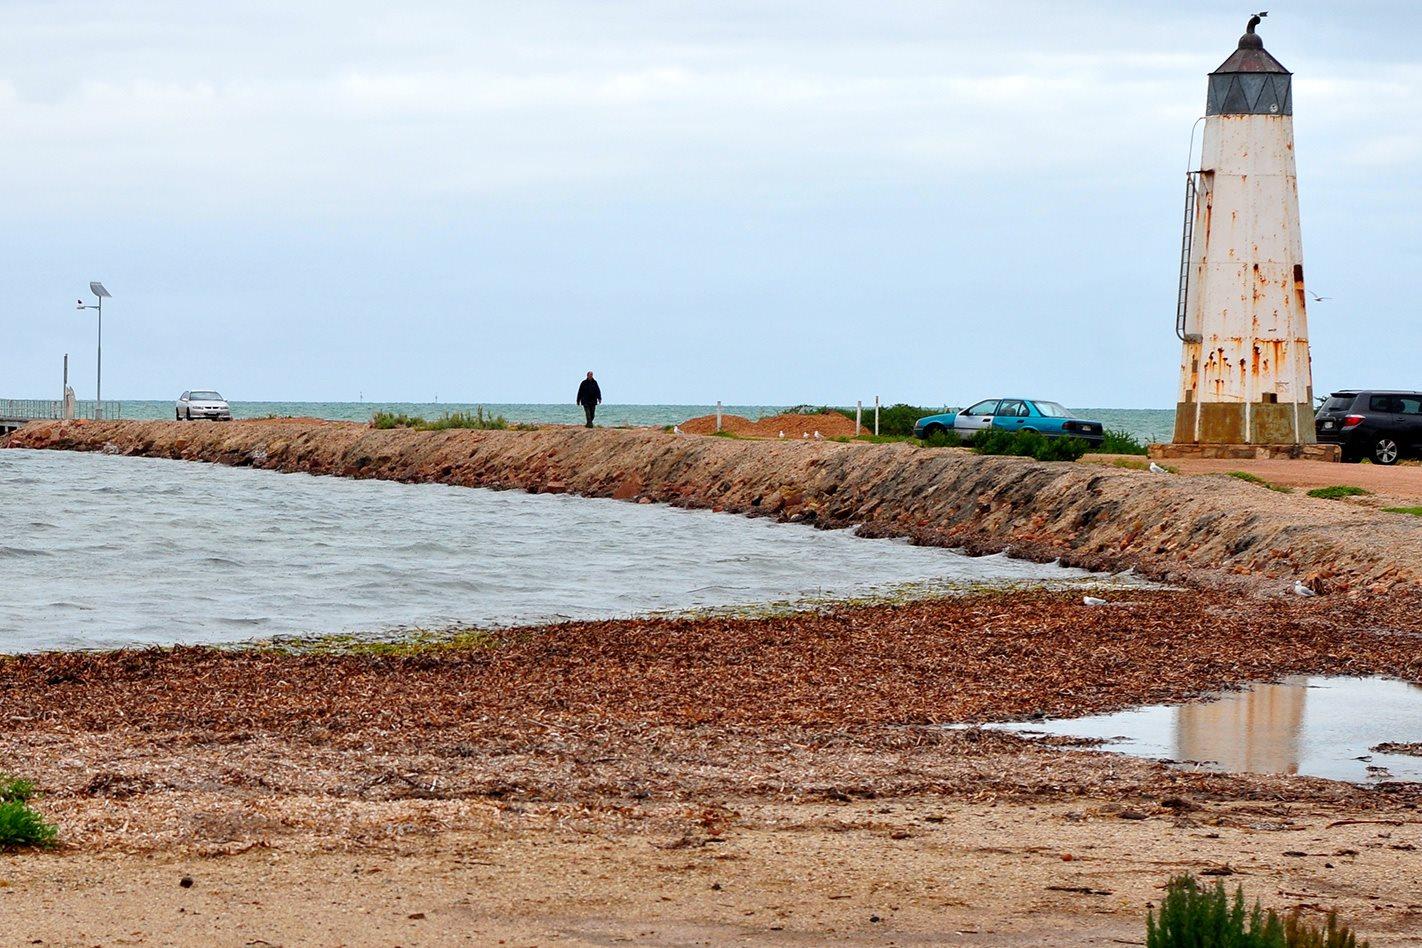 Port-Germein-Lighthouse,-Flinders-Ranges.jpg